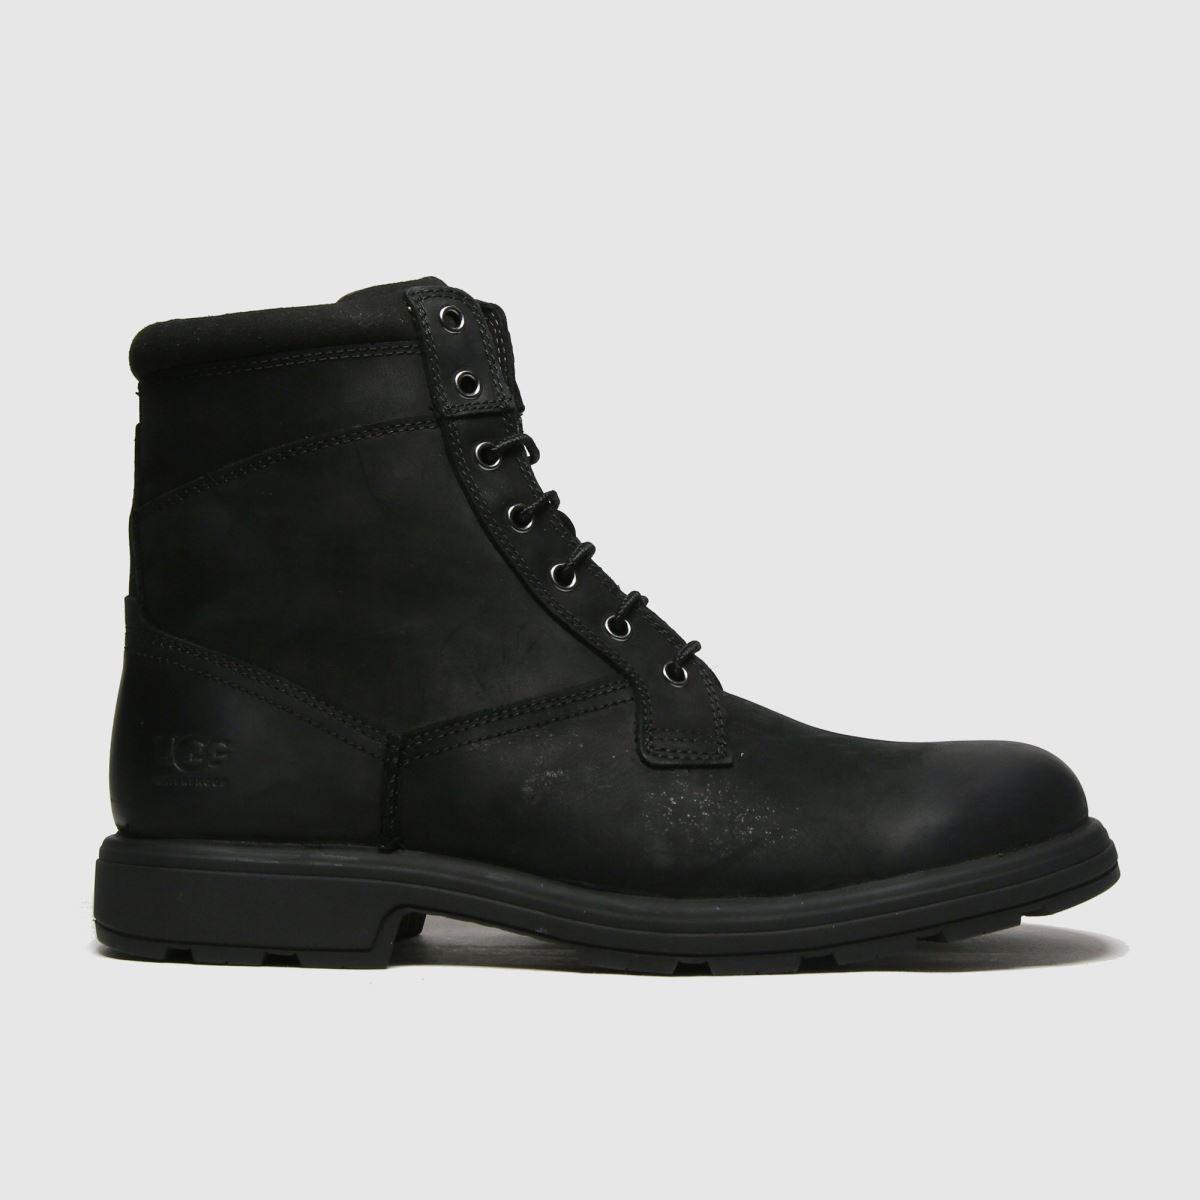 UGG Black Biltmore Workboot Boots